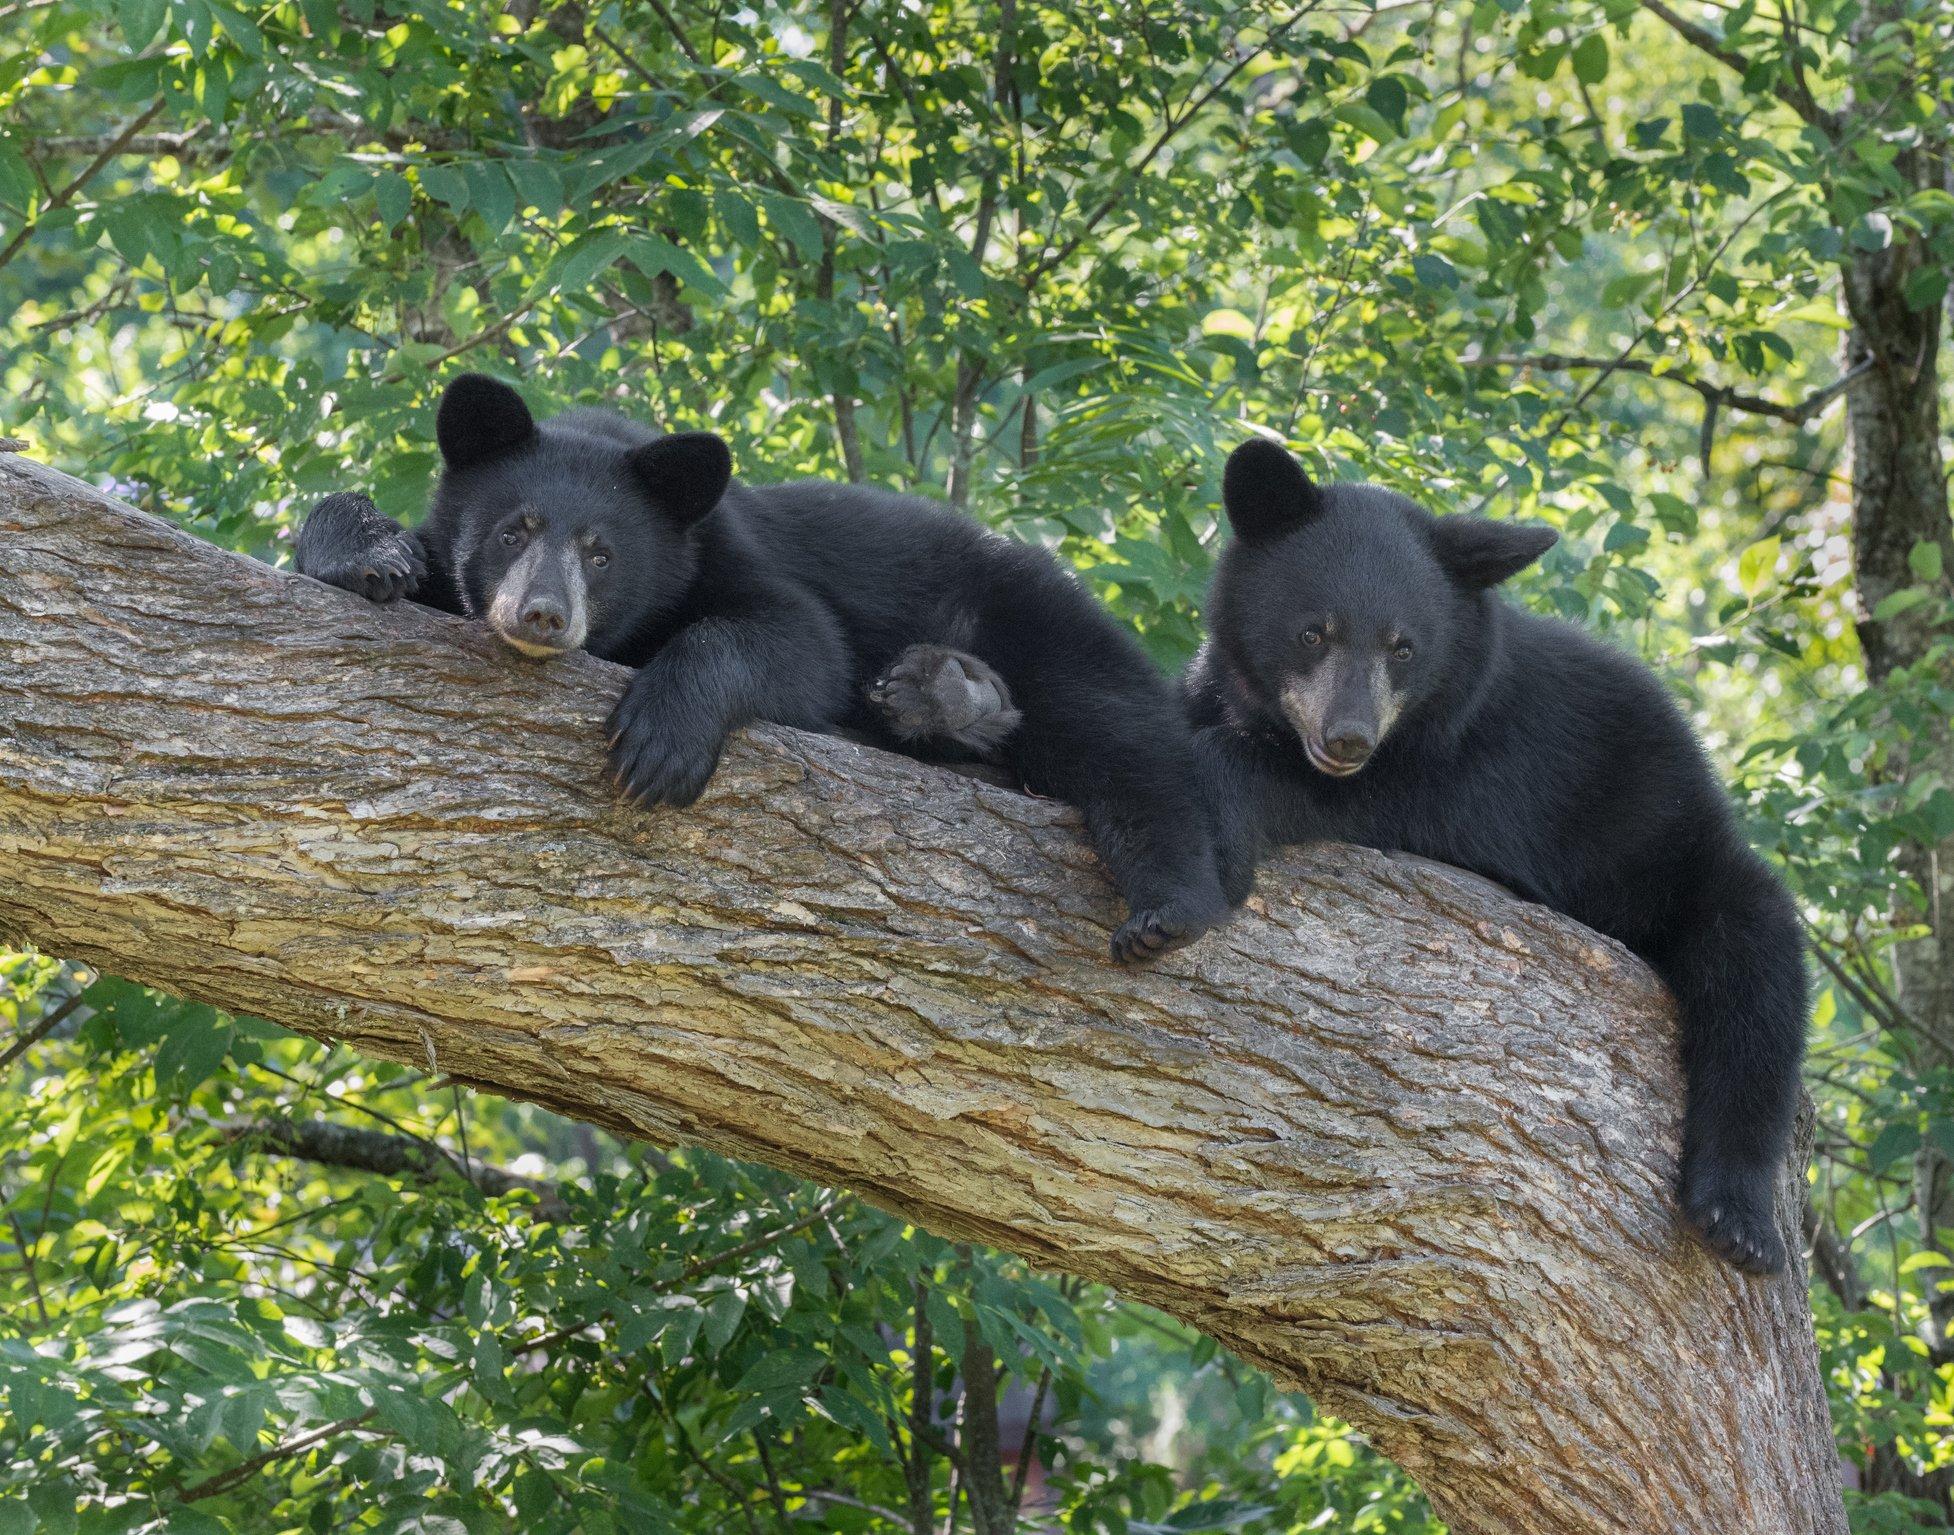 Keeping Bears Wild